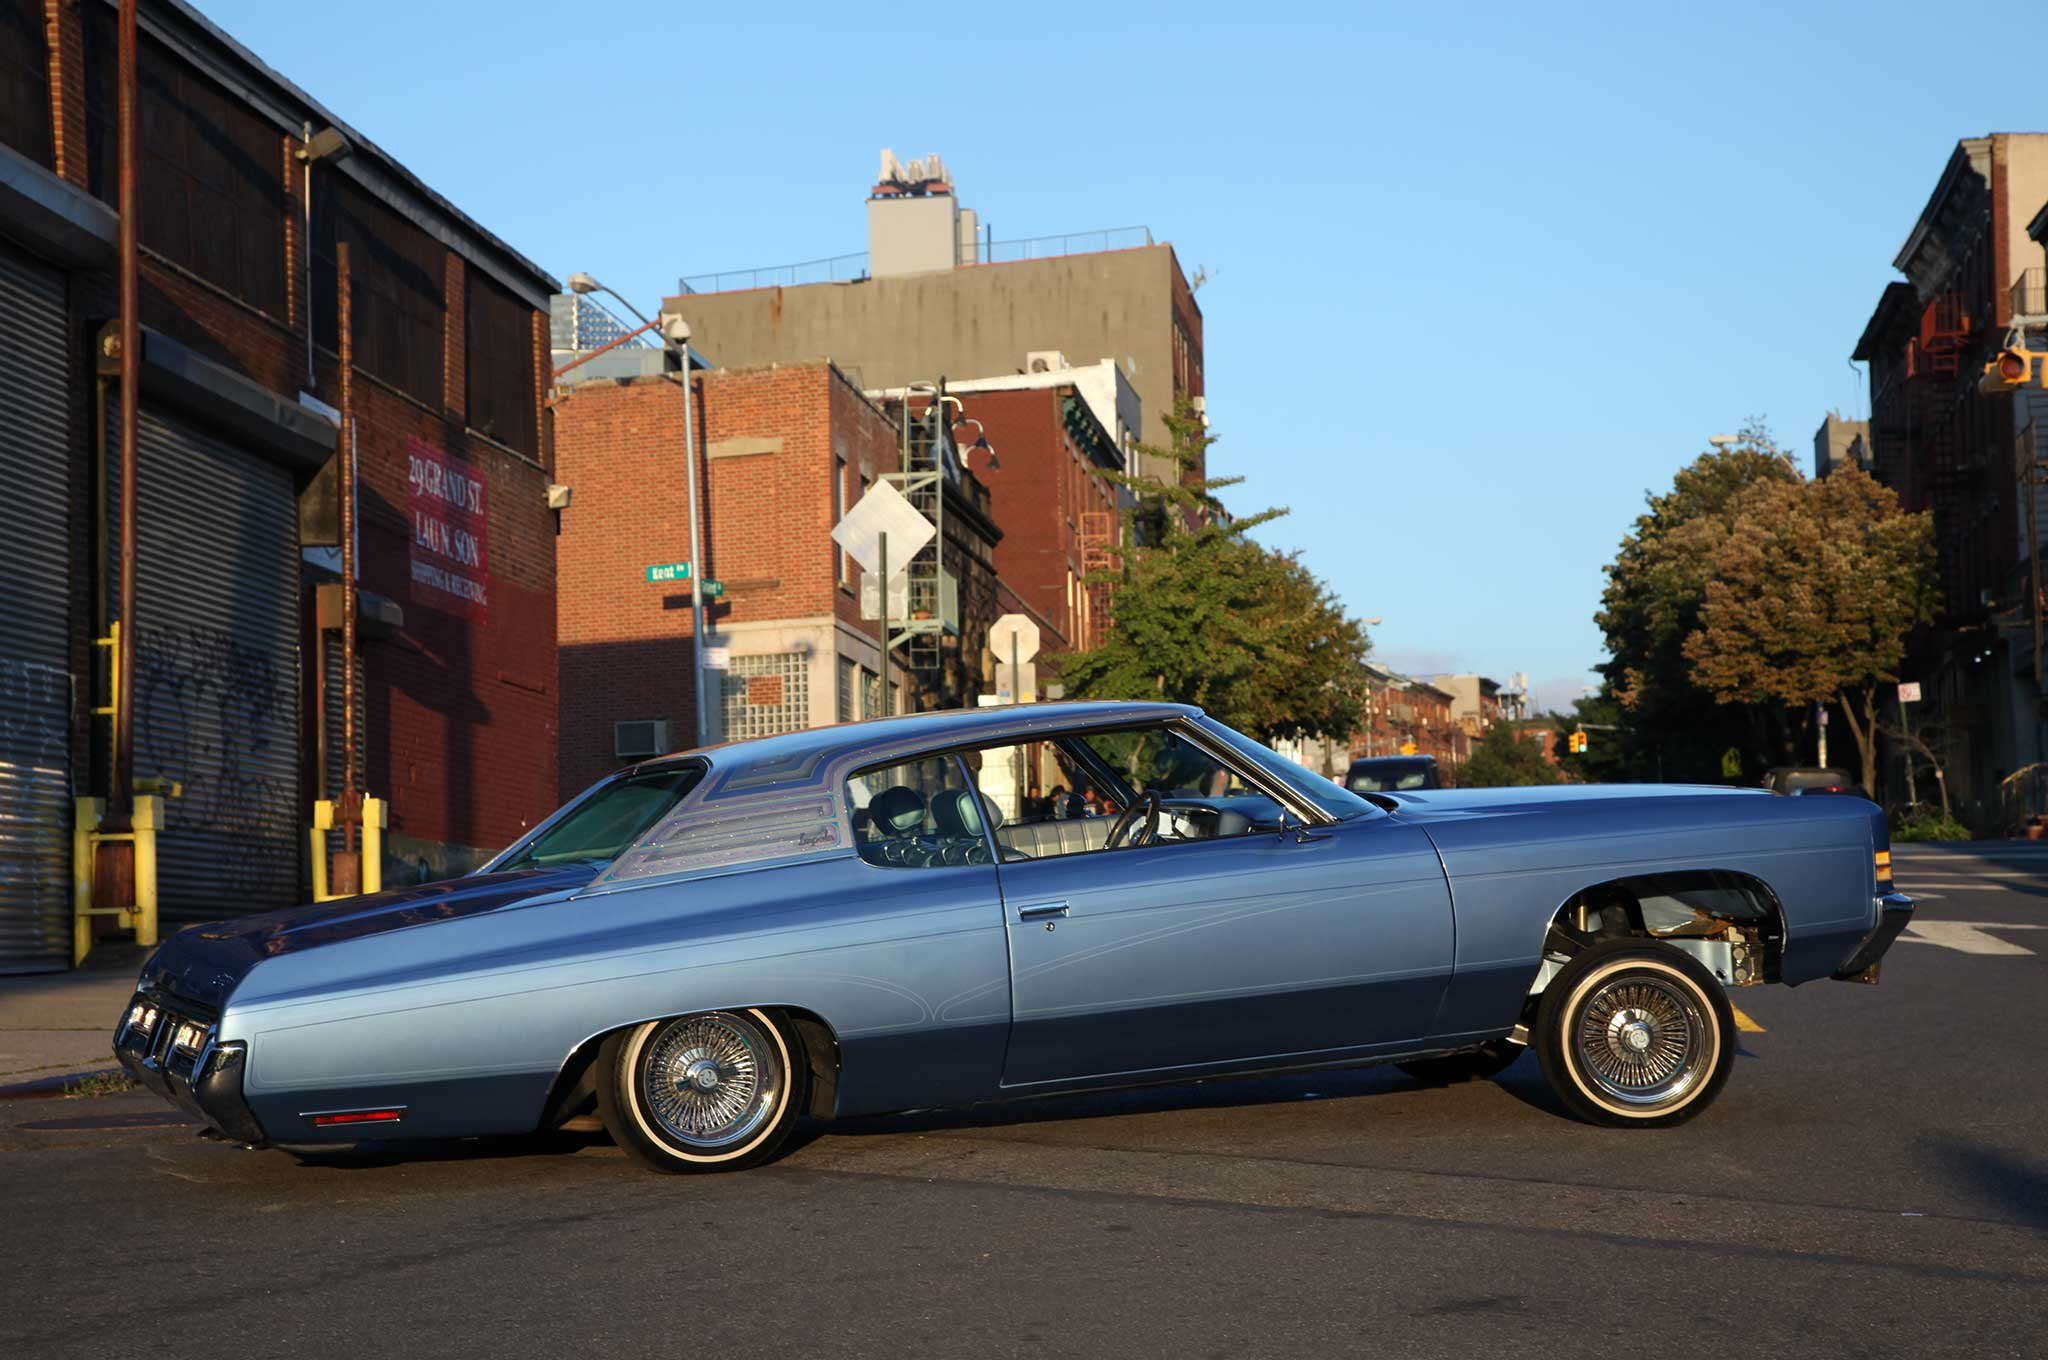 A 72 Chevy Impala That S La Built For Ny Riding